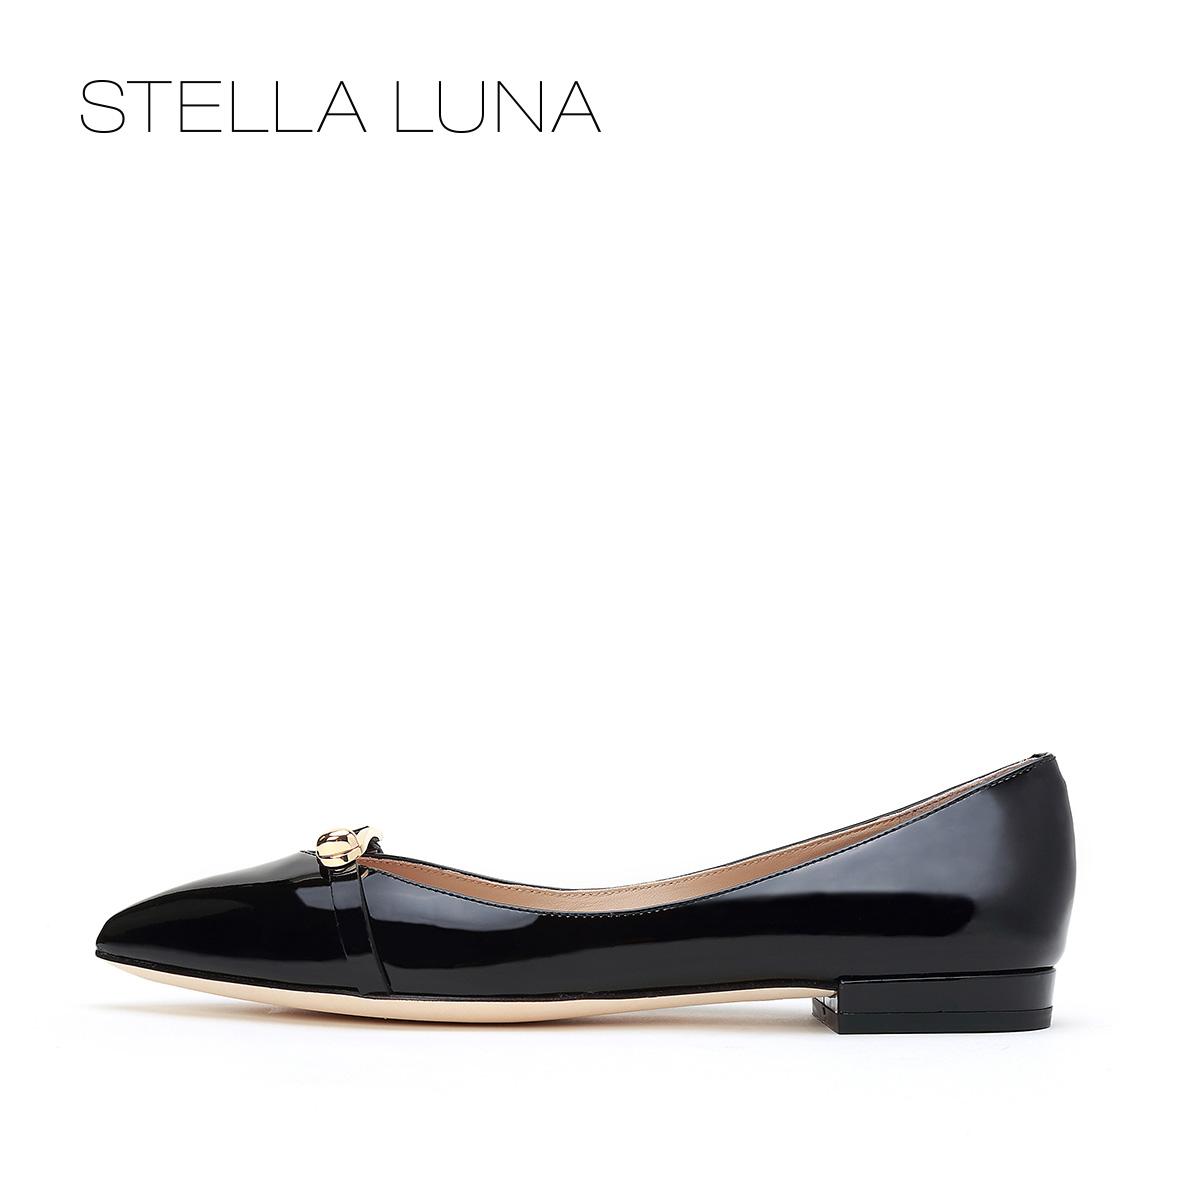 STELLA LUNA春夏尖头浅口女鞋牛皮金属buckle低跟单鞋SG134L24001